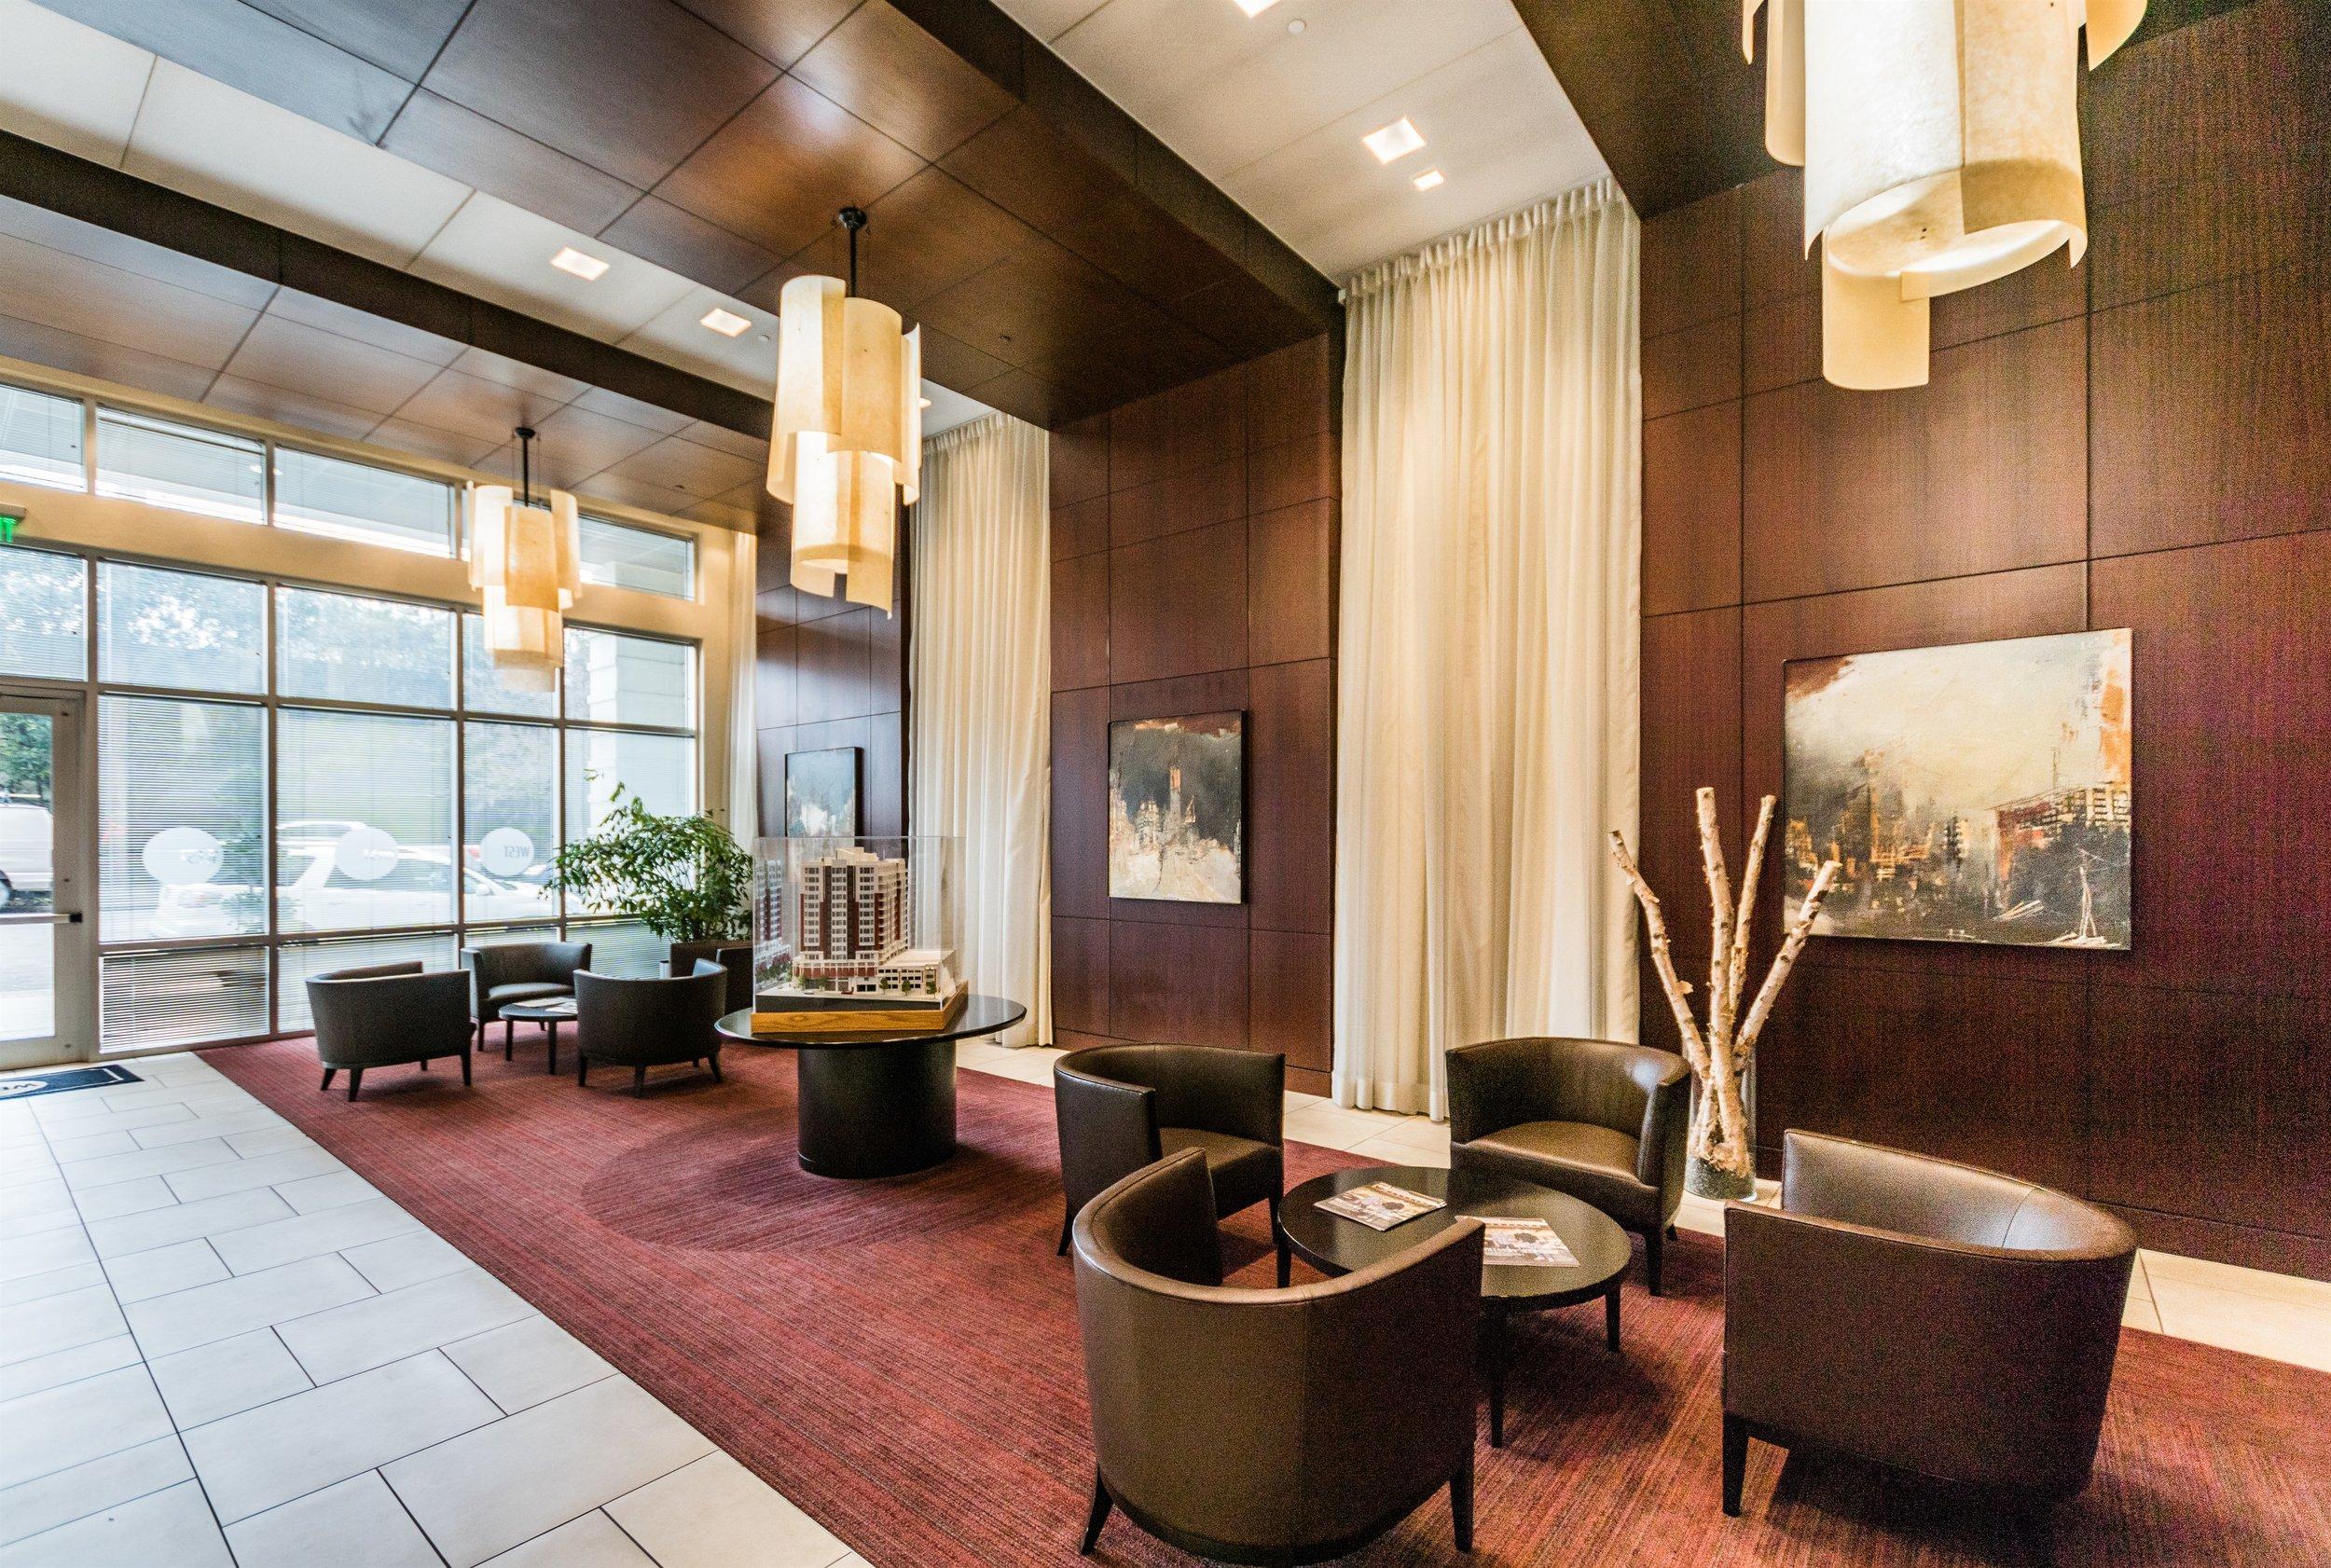 003_Building Lobby.jpg